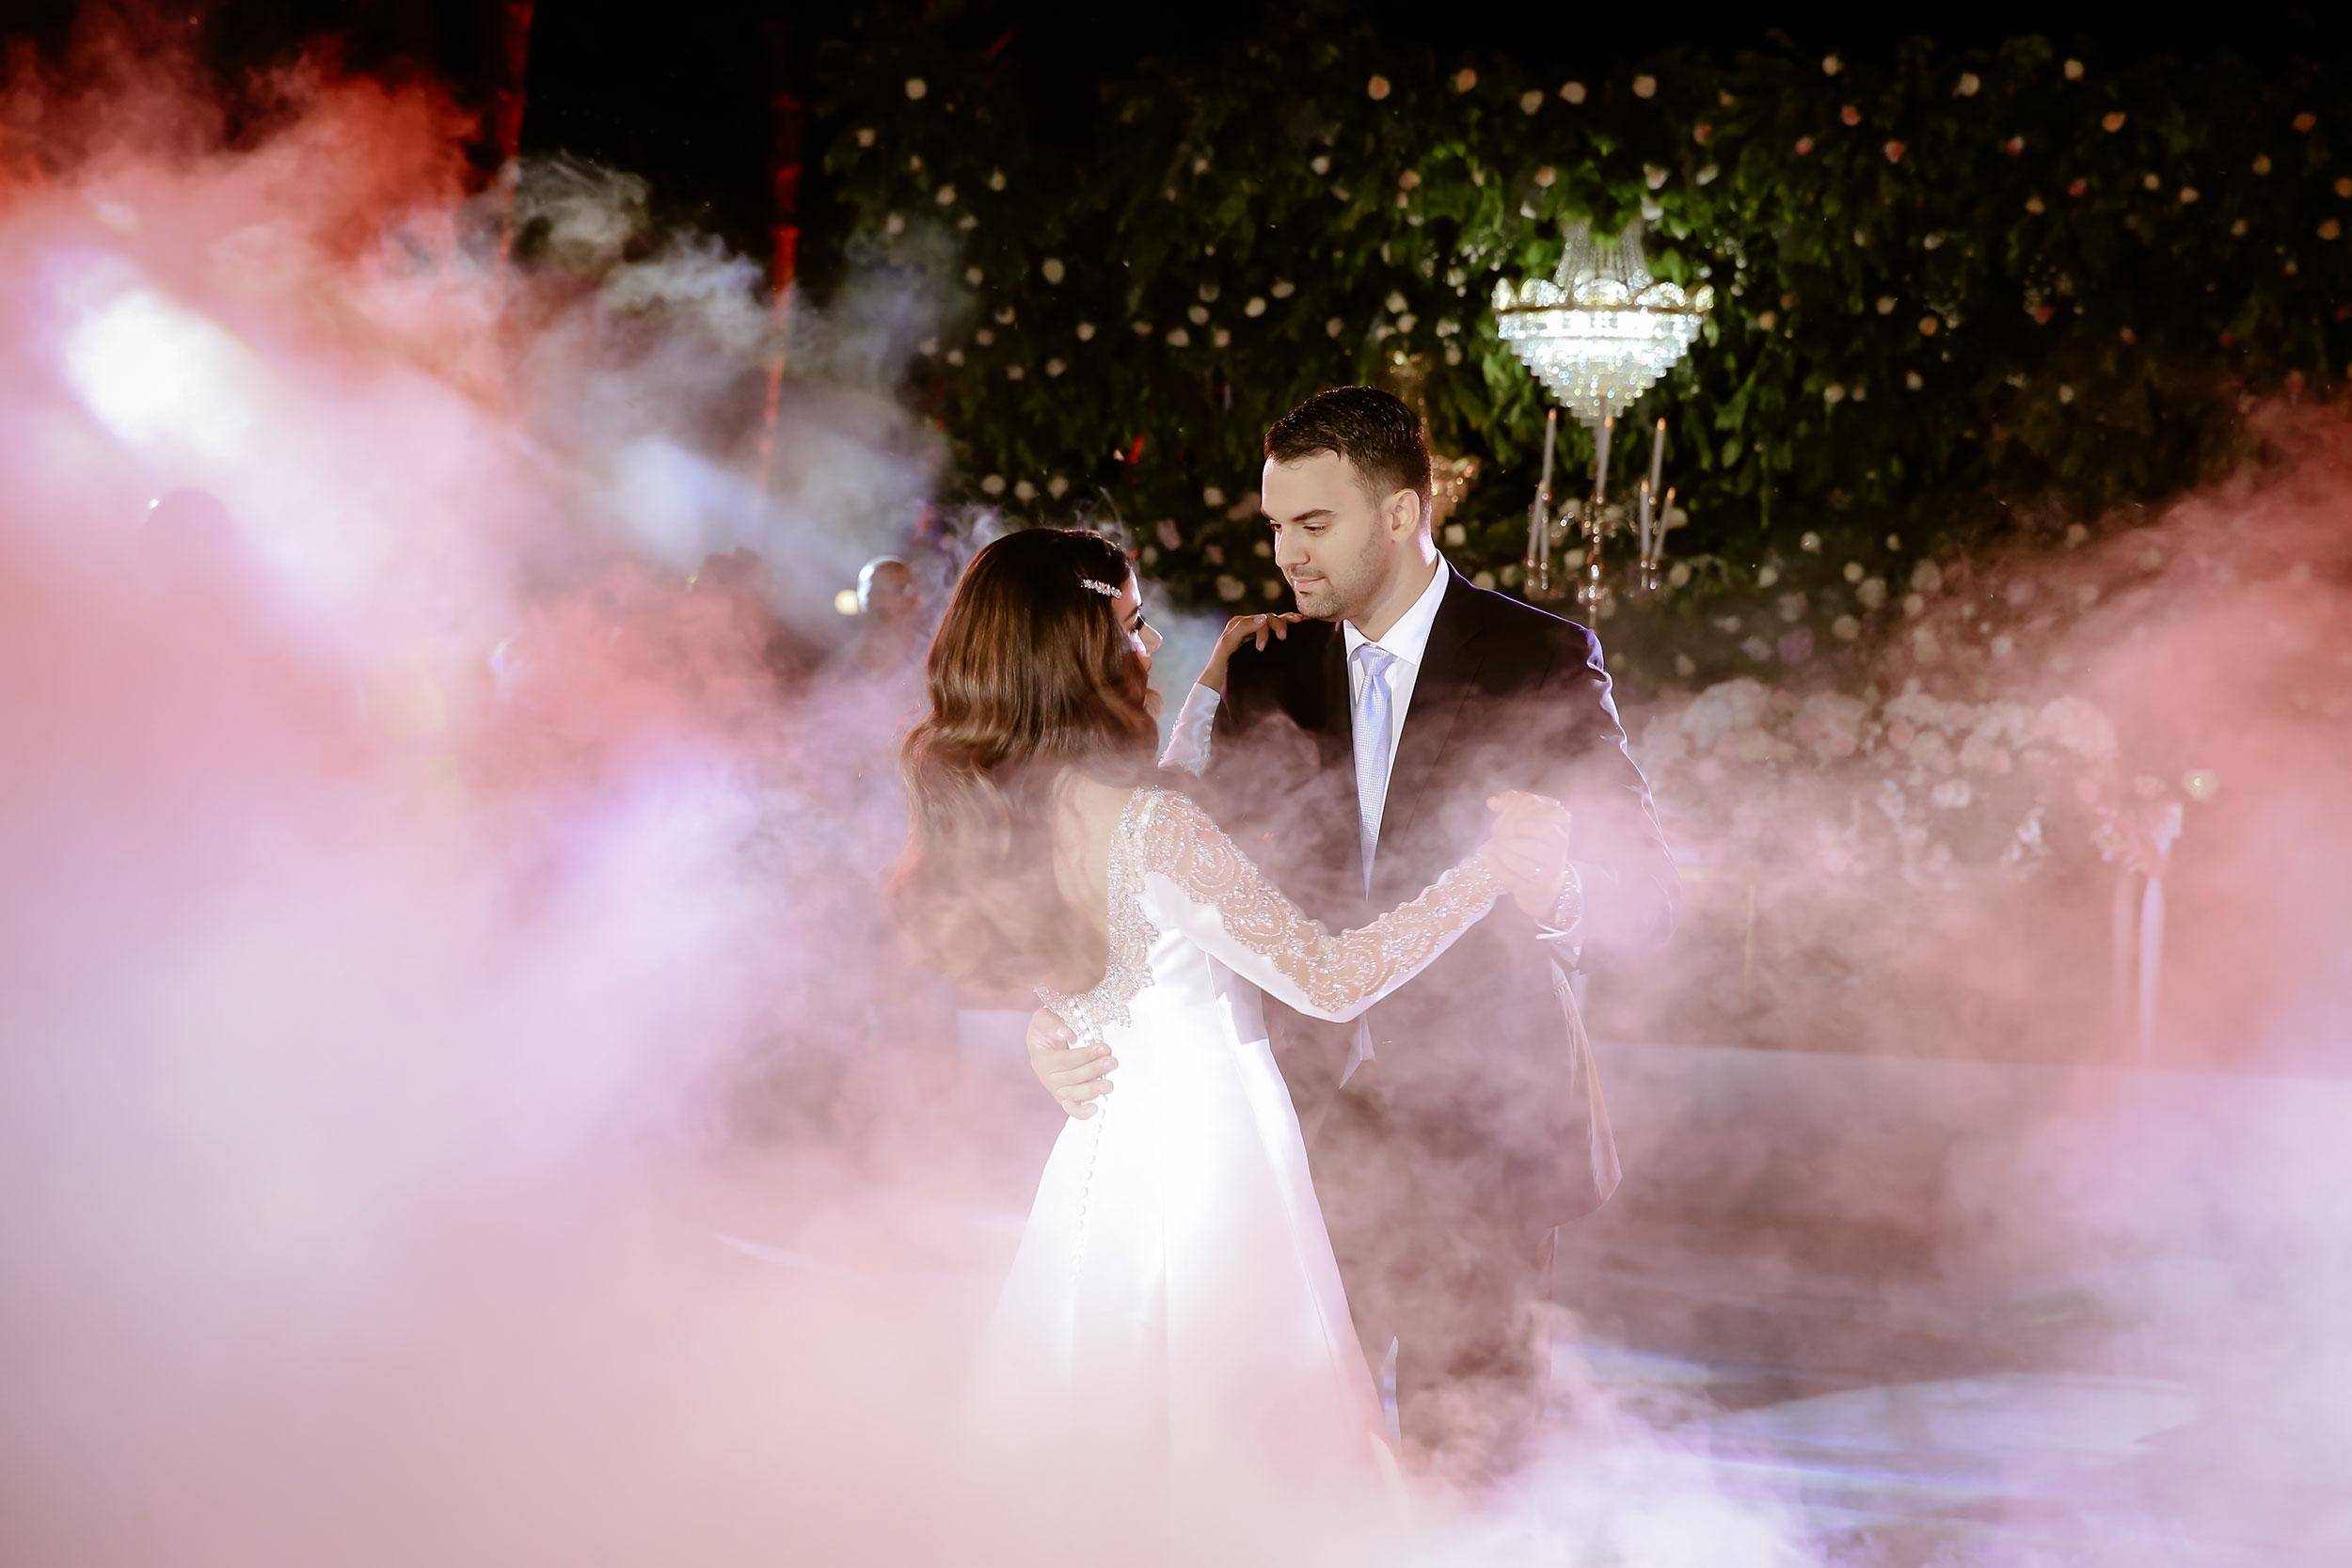 Wedding inspo, wedding inspiration of an outdoor dancefloor.